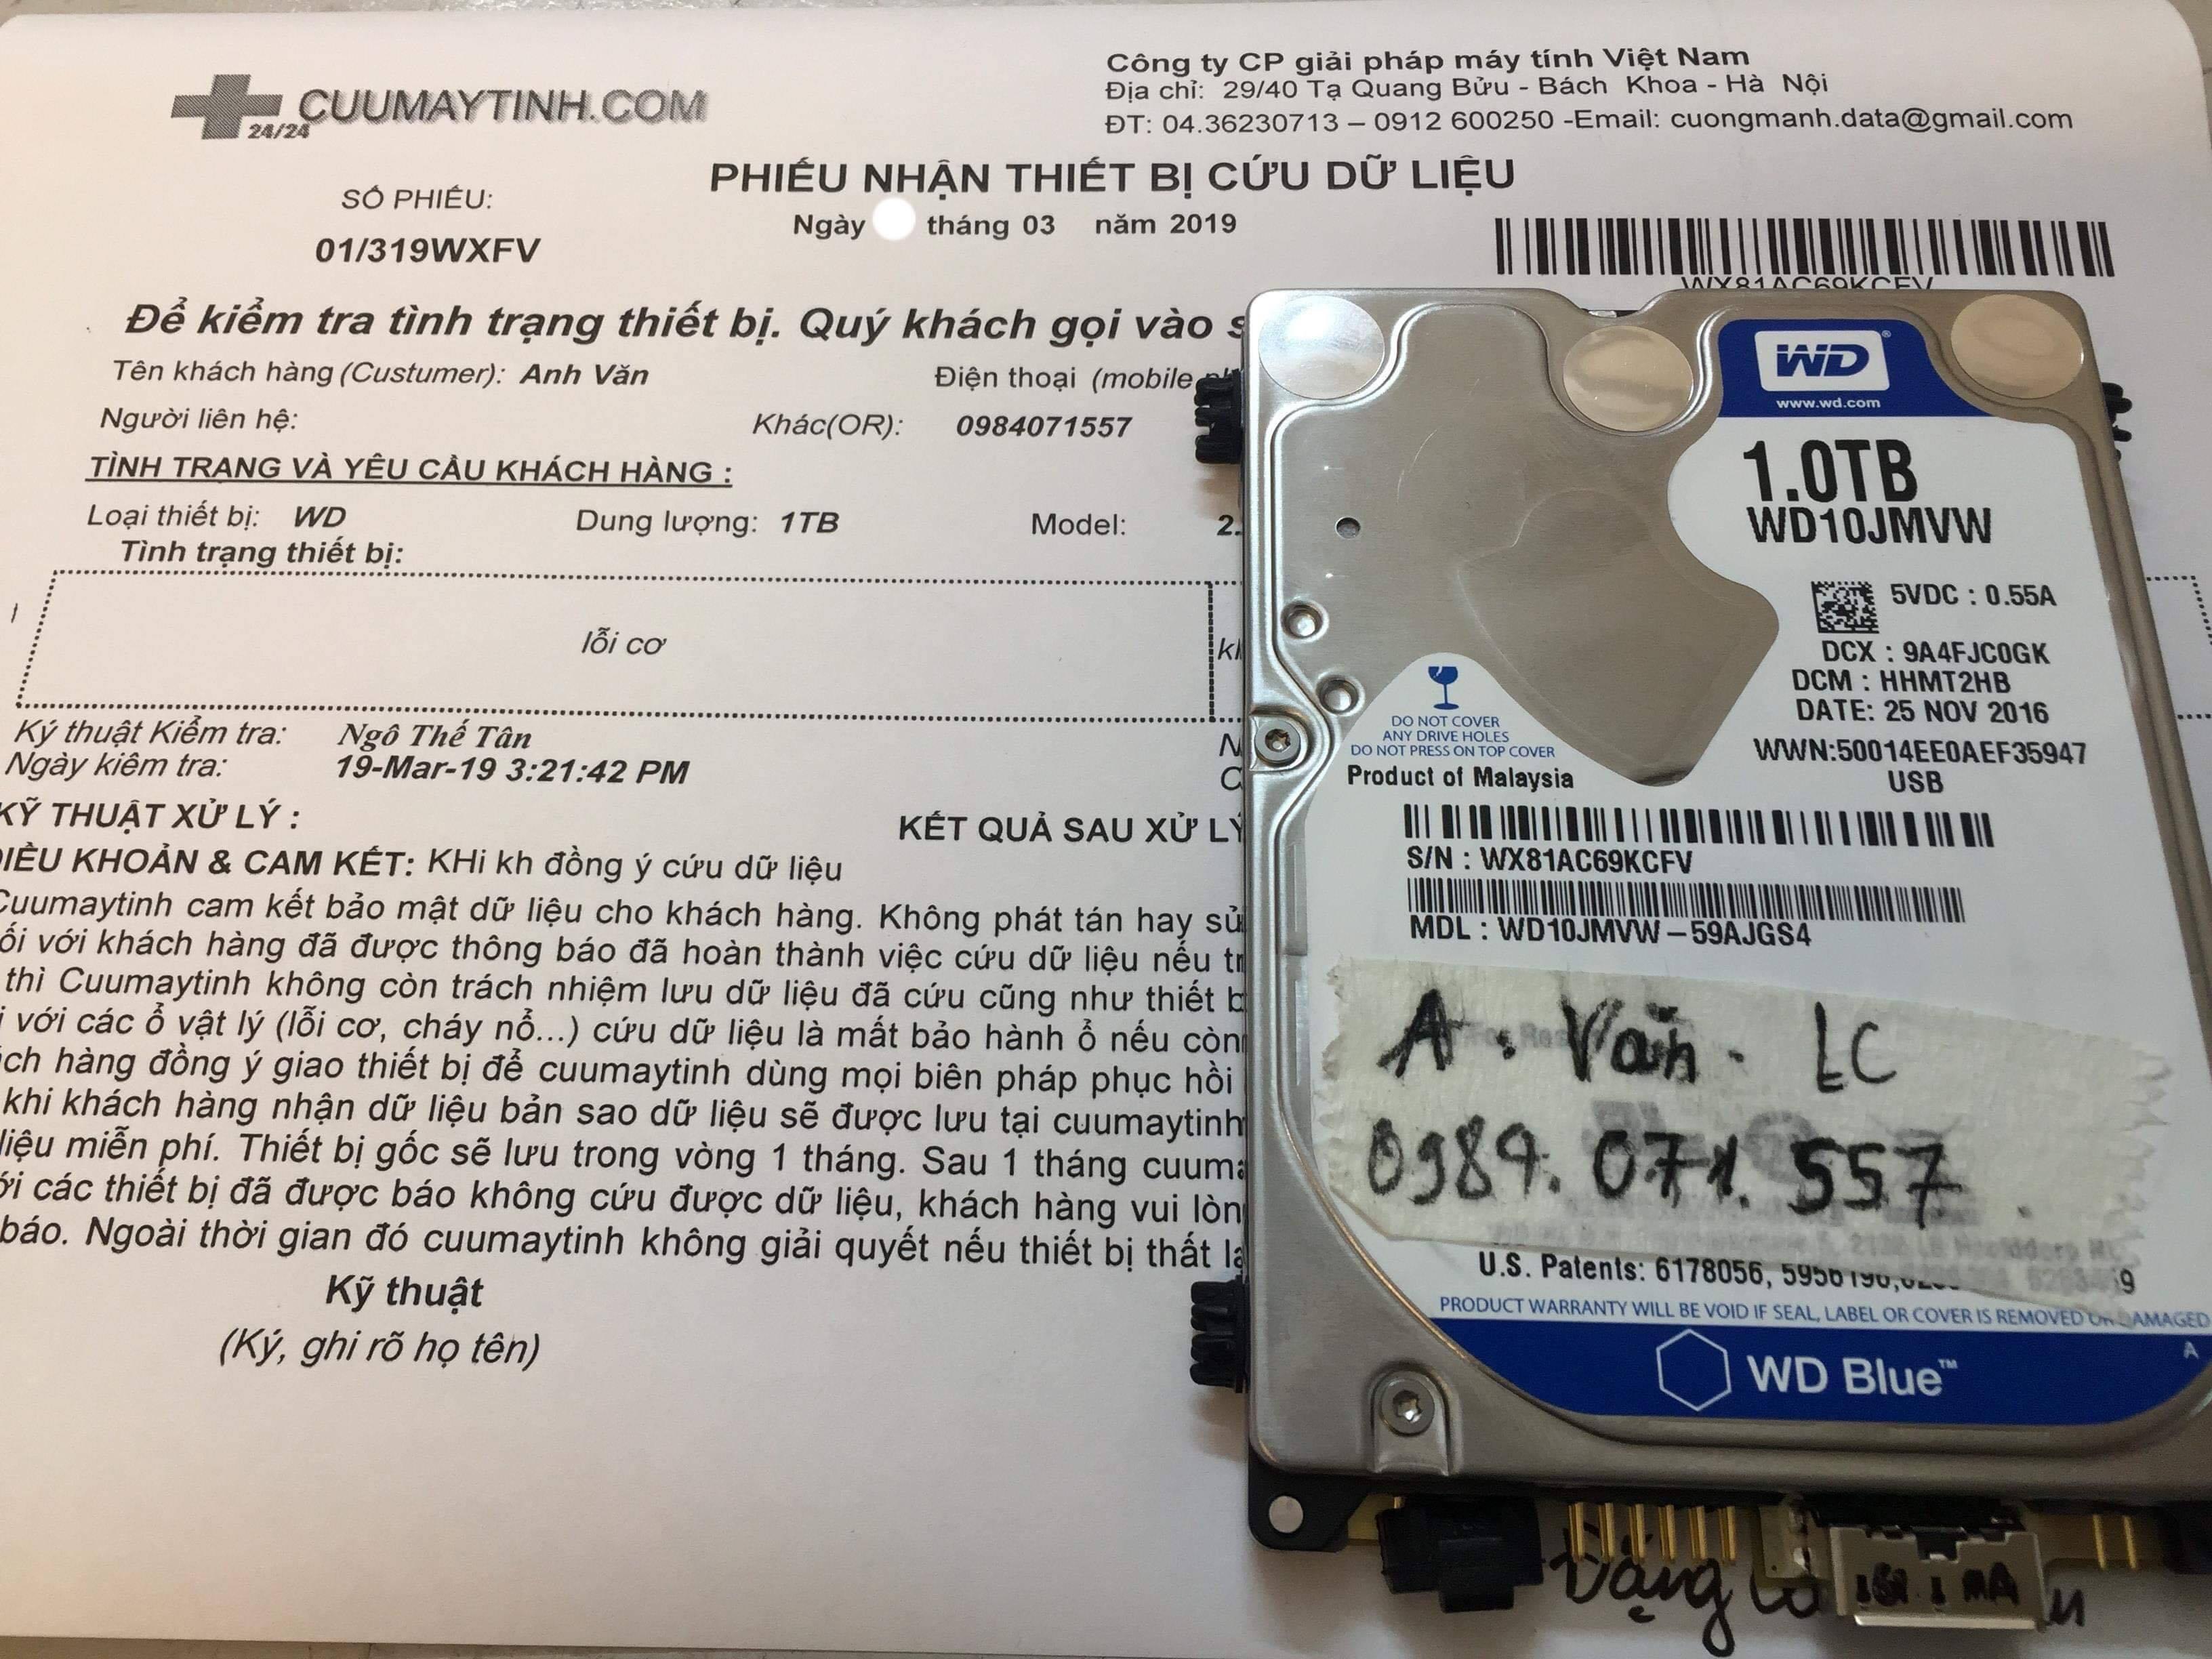 Cứu dữ liệu ổ cứng Western 1TB lỗi cơ 20/03/2019 - cuumaytinh